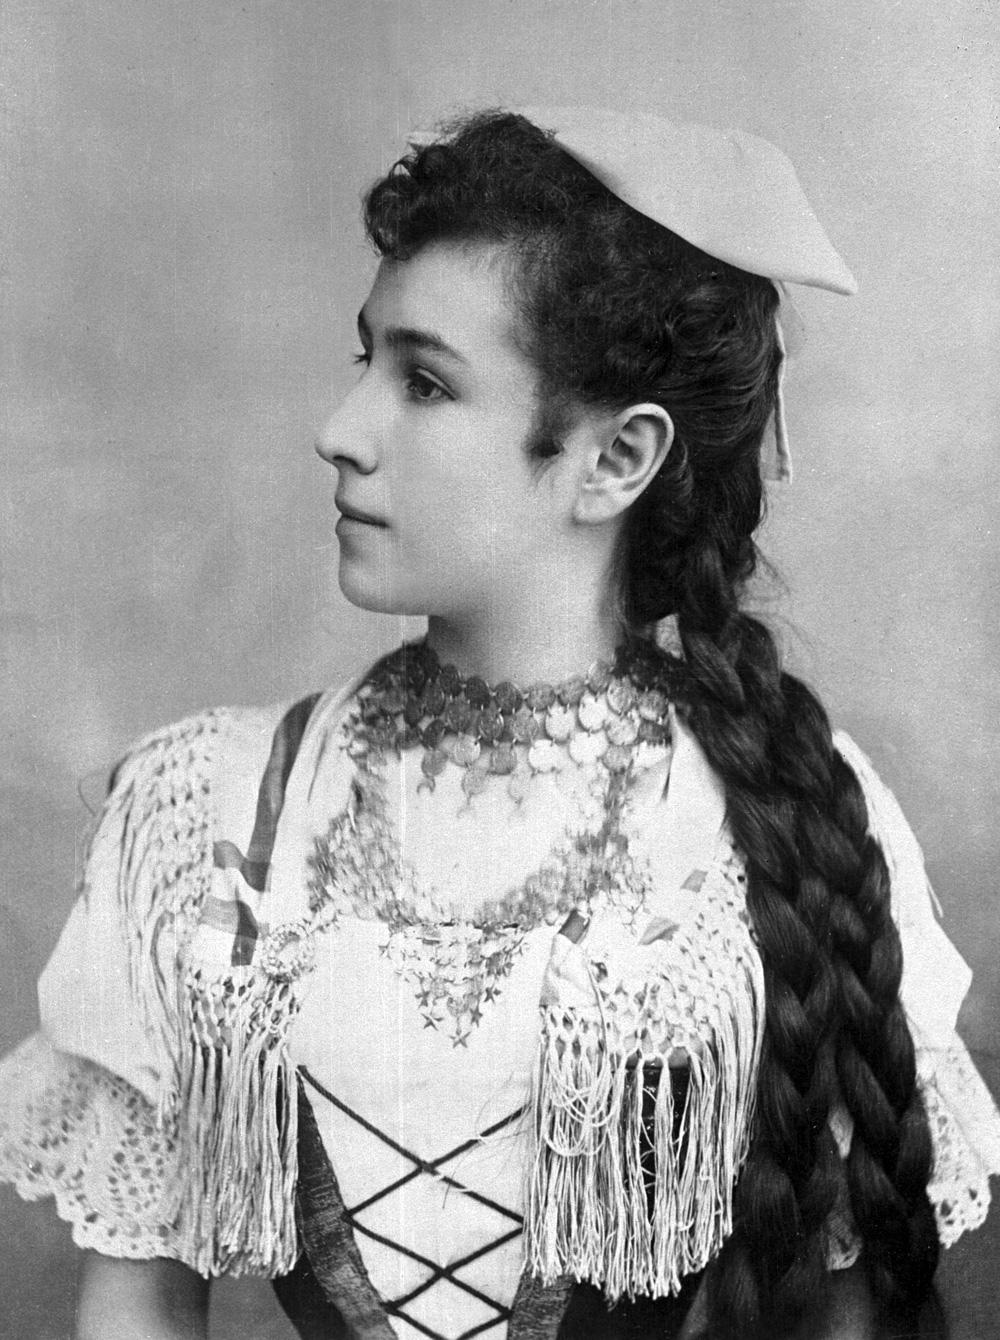 Балерина Матильда Кшесинская. 1896 год